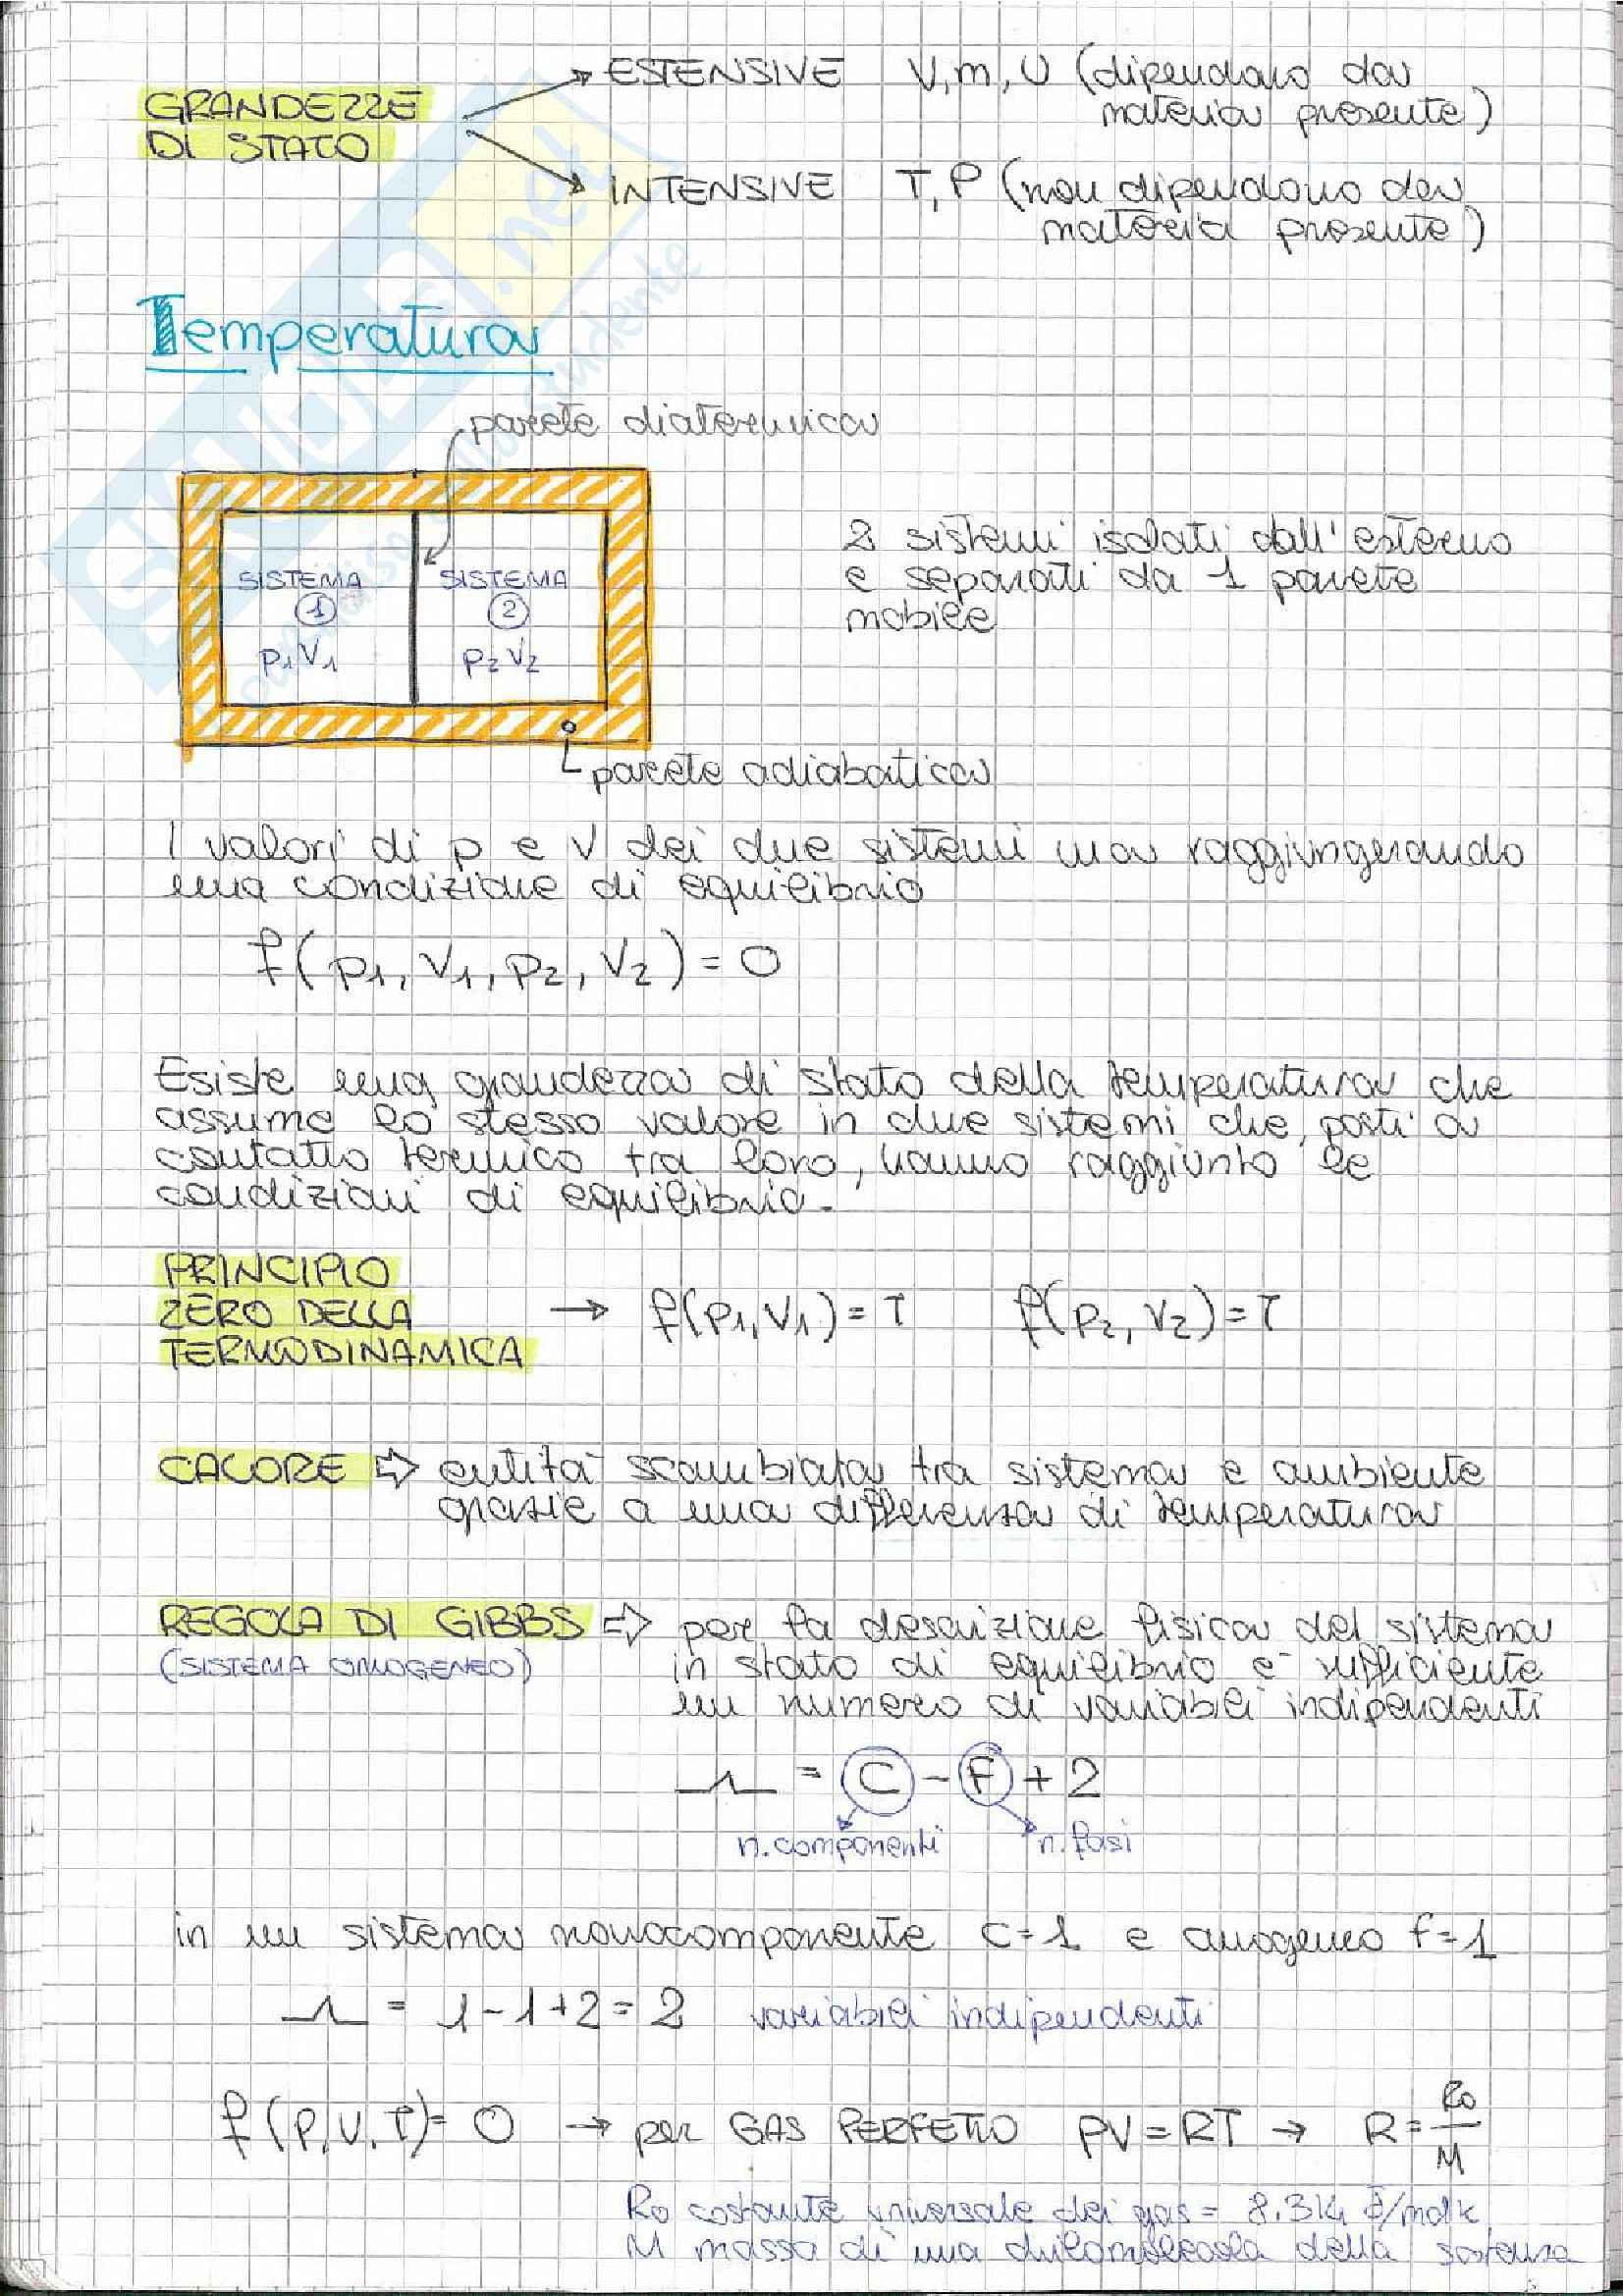 Riassunto esame Fisica Tecnica Ambientale, libro consigliato Fisica Tecnica Ambientale. Termodinamica, Moncada, lo Giudice: termodinamica Pag. 2